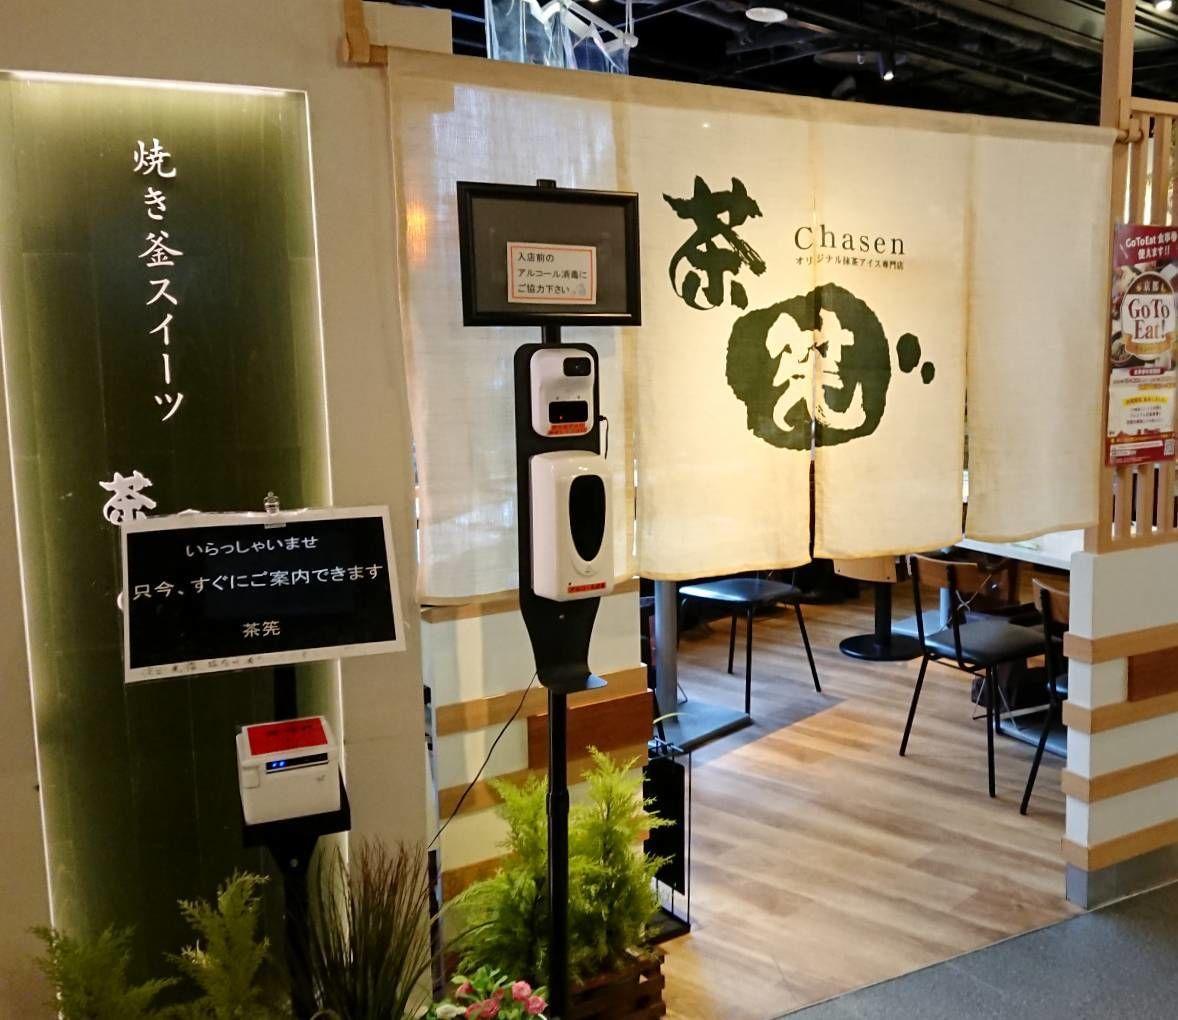 f:id:mainichi-caffe:20210515211212j:plain